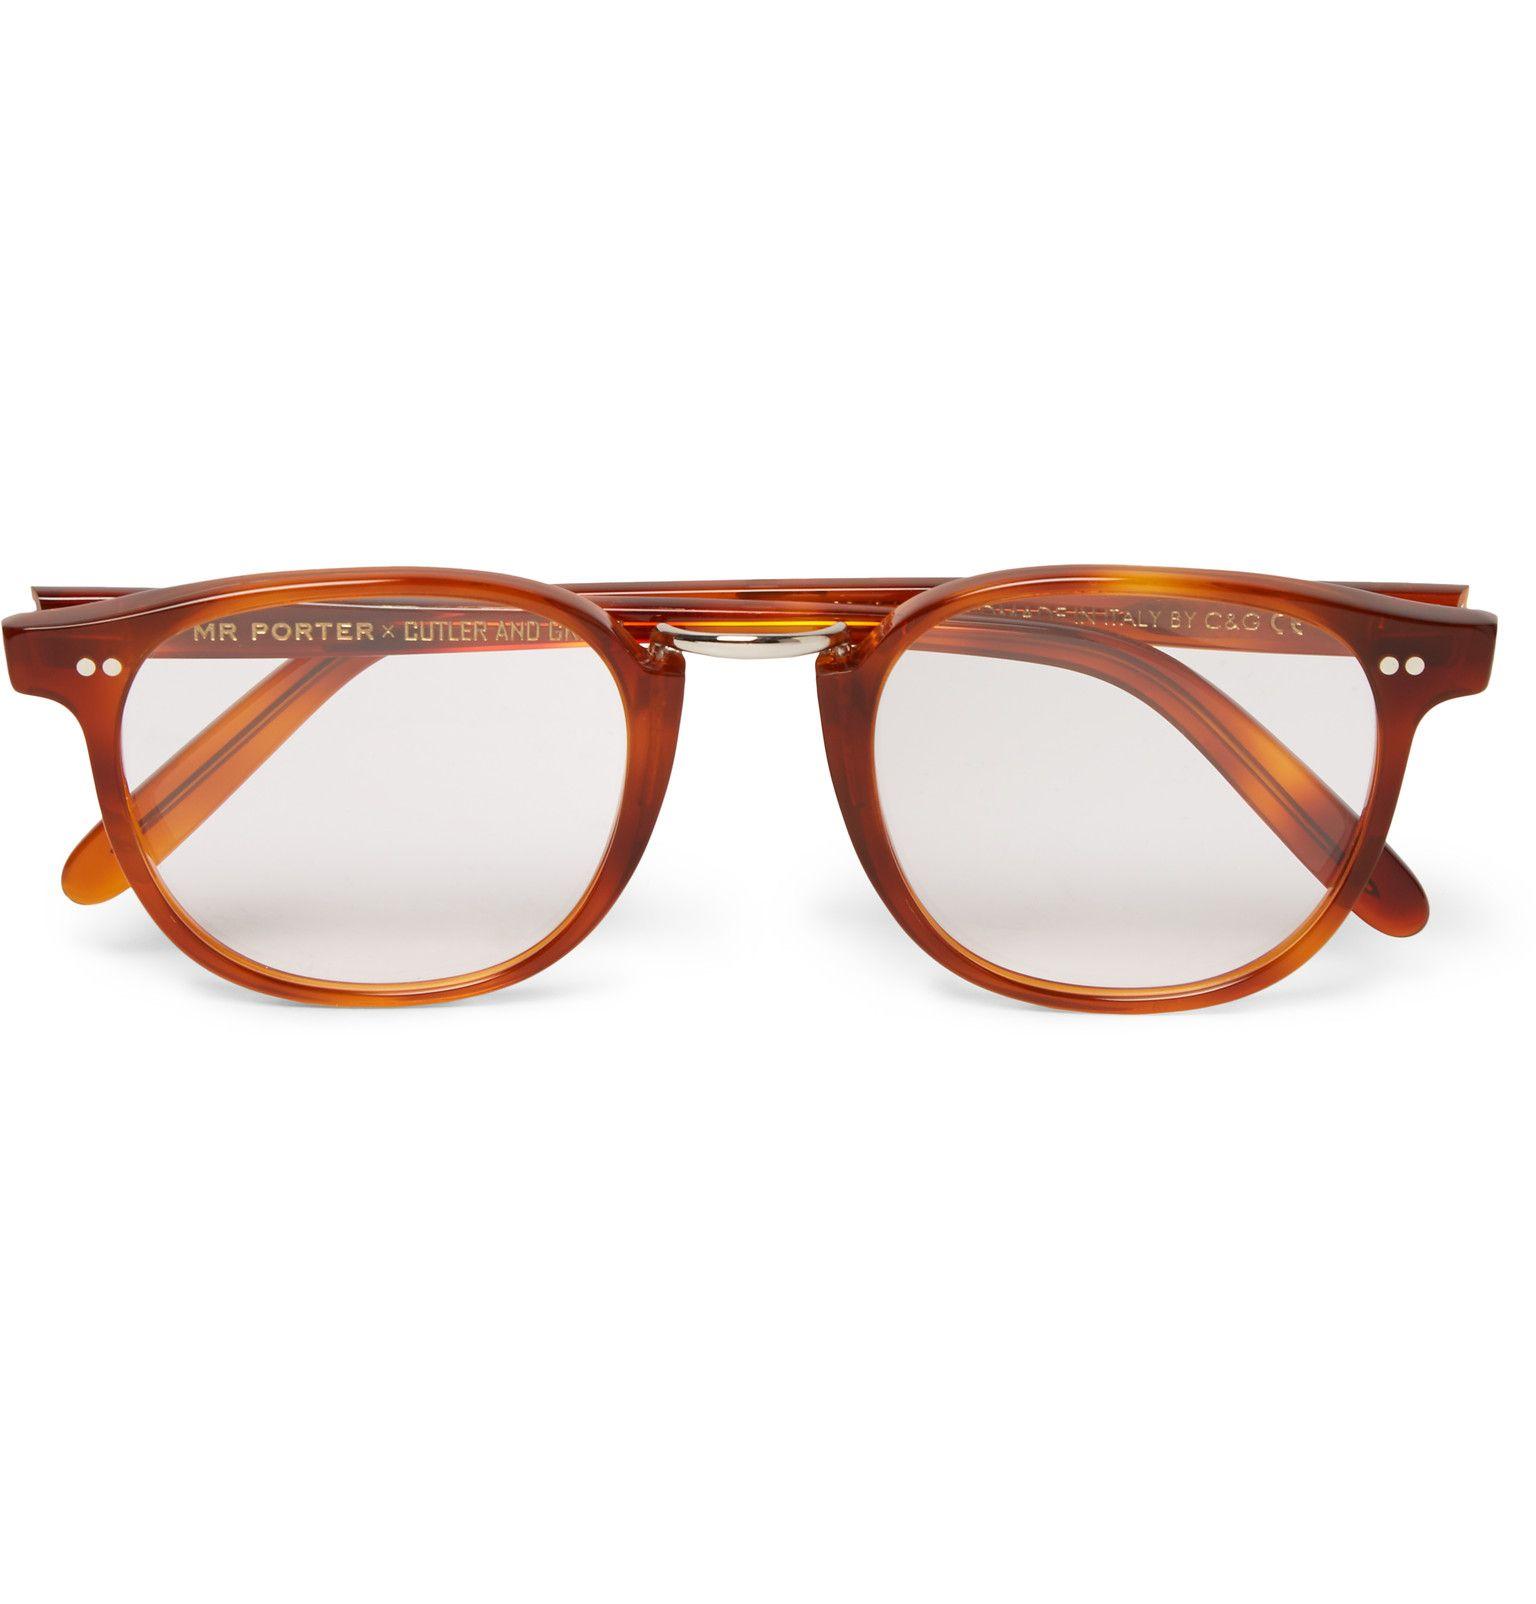 Cutler and Gross Round-frame Tortoiseshell Acetate And Gold-tone Sunglasses - Tortoiseshell 3GcMReNY5